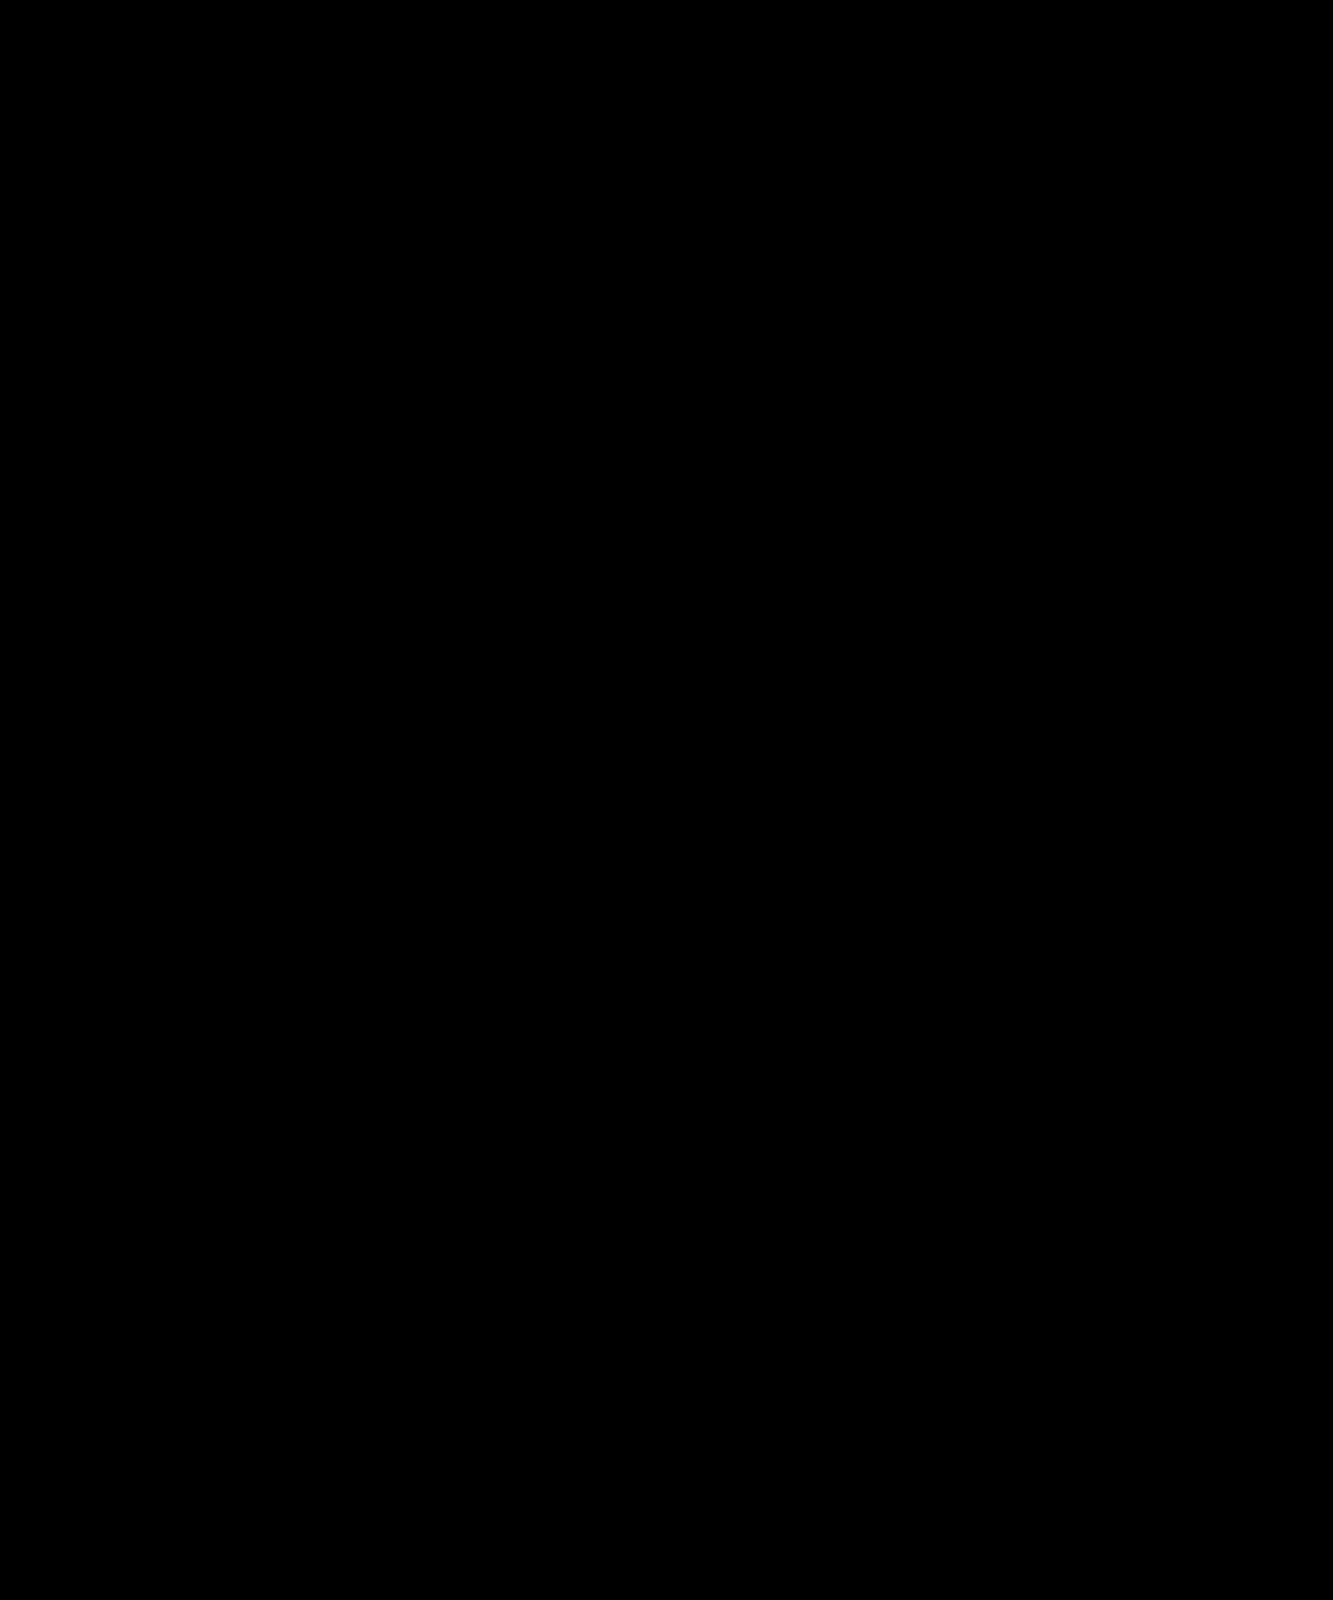 Flower monogram clipart. Rivka s renditions key